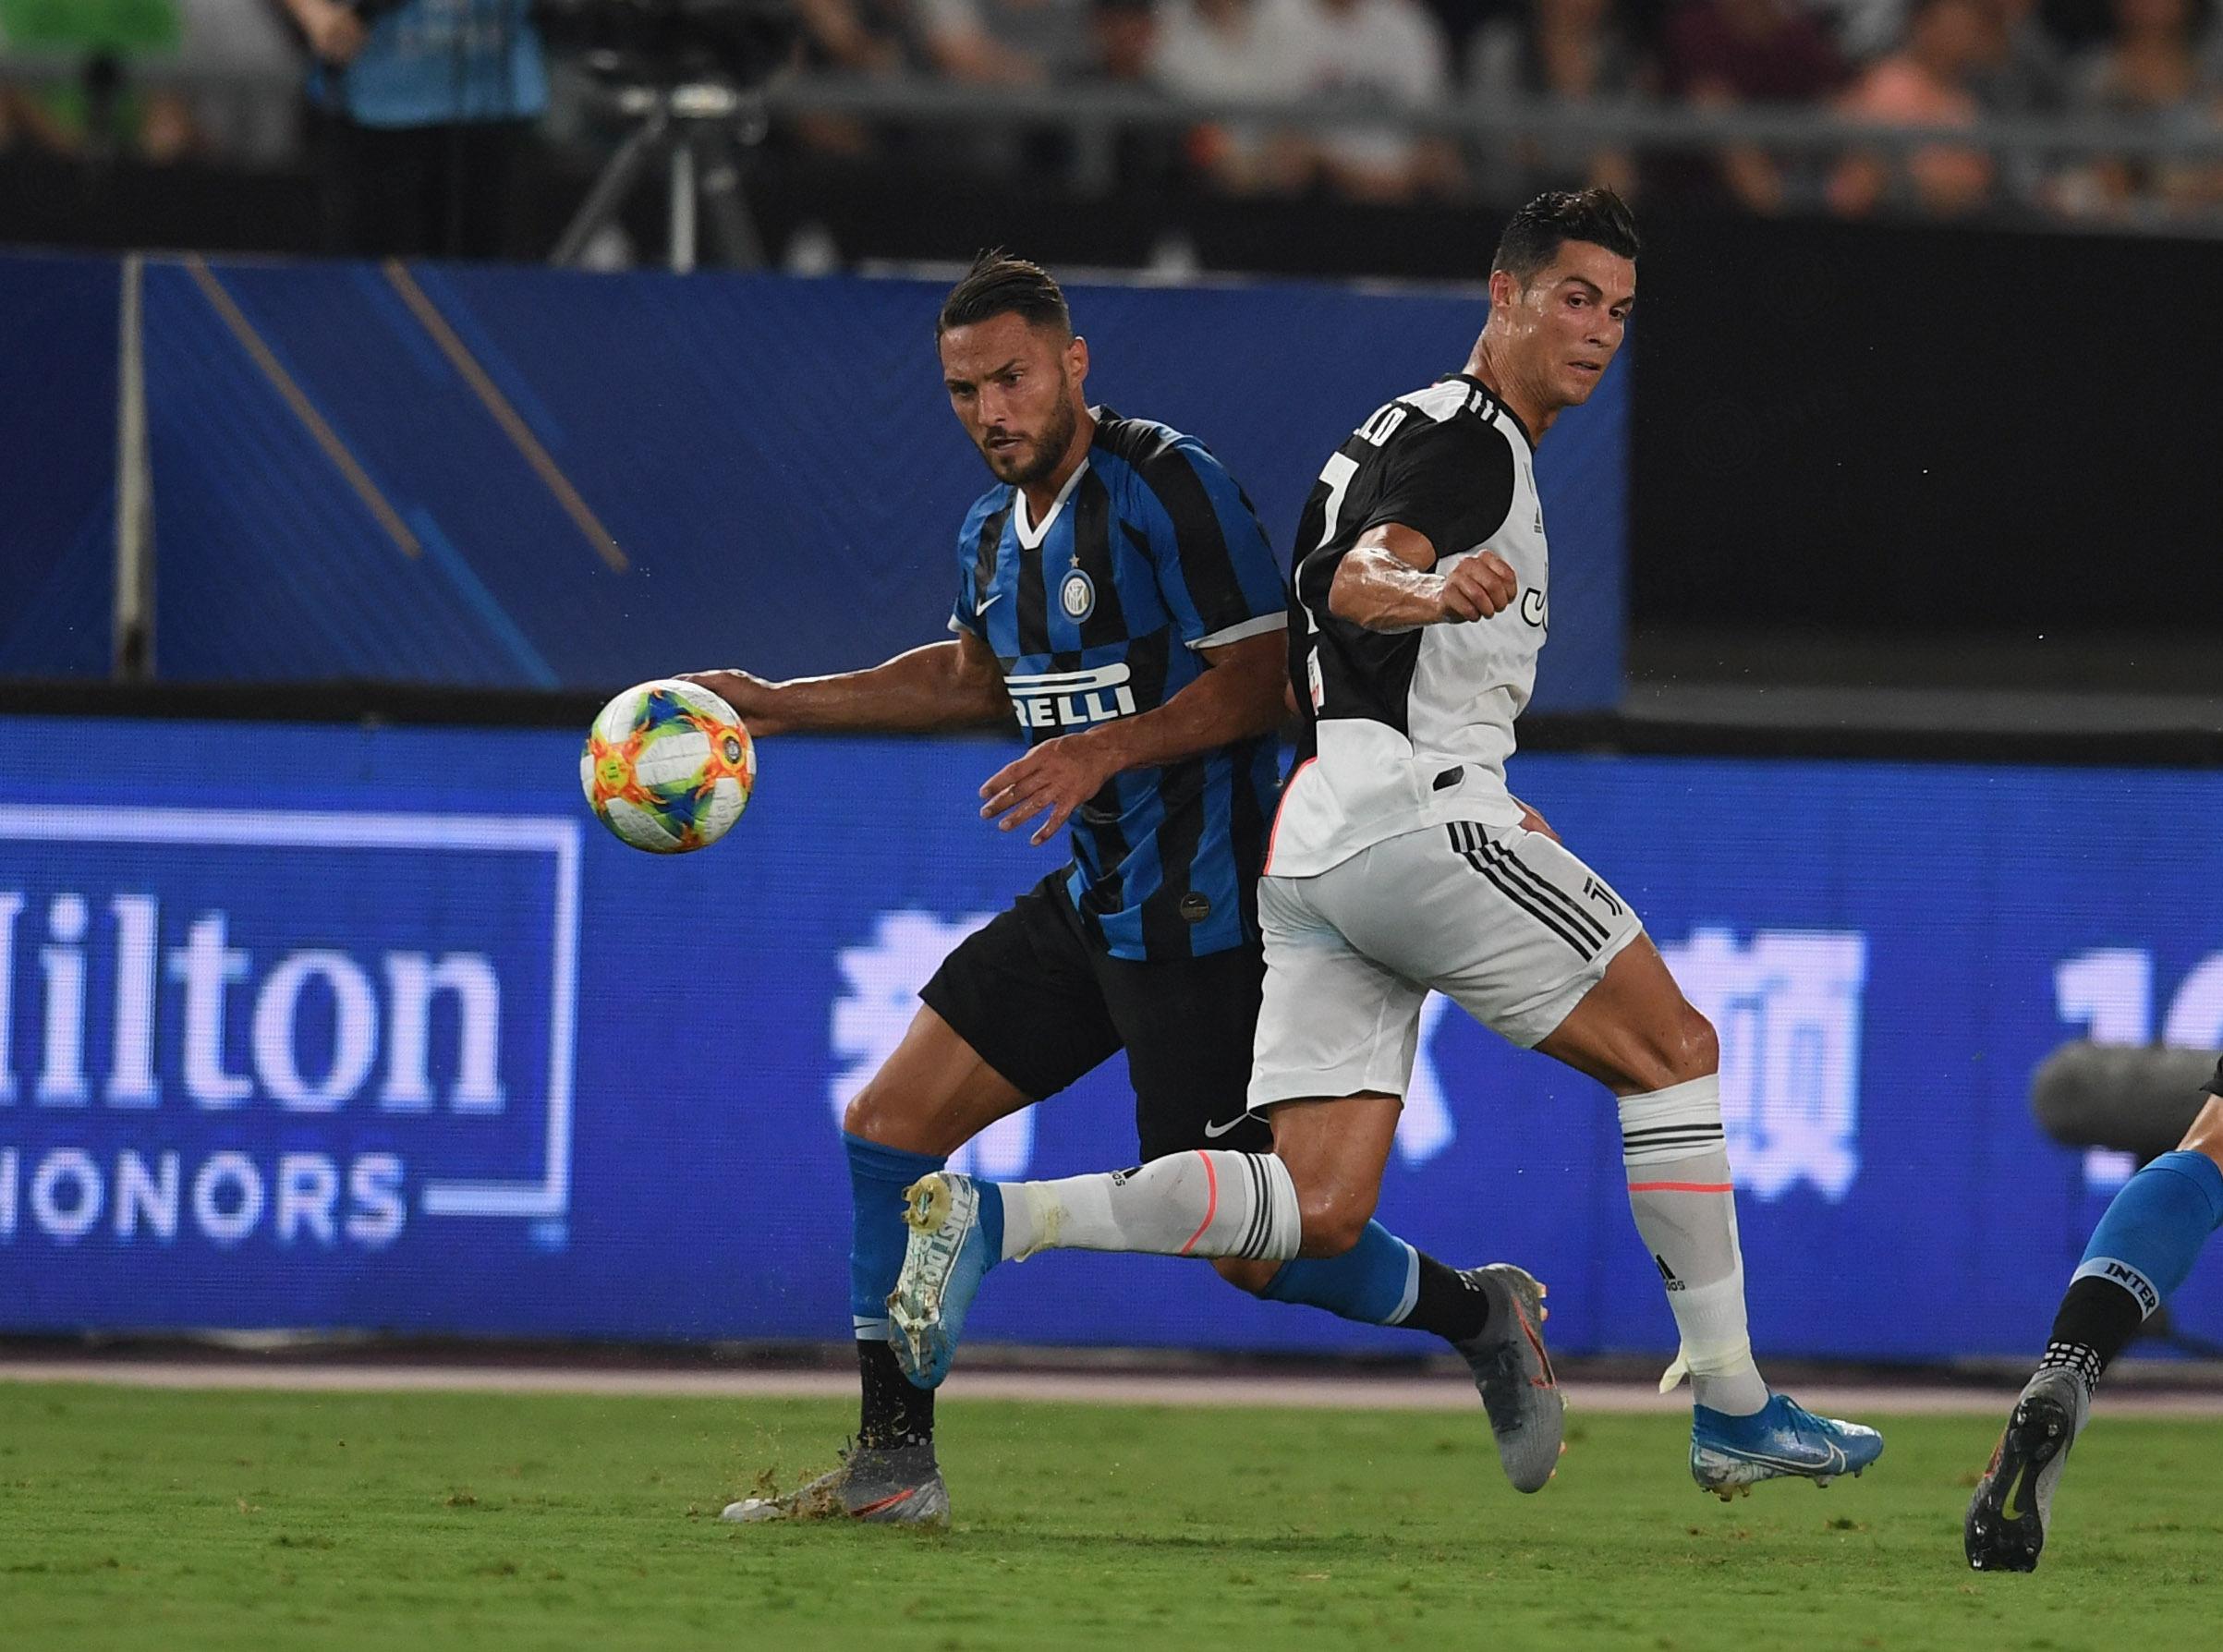 ICC 2019: A visual recap of Inter vs. Juventus